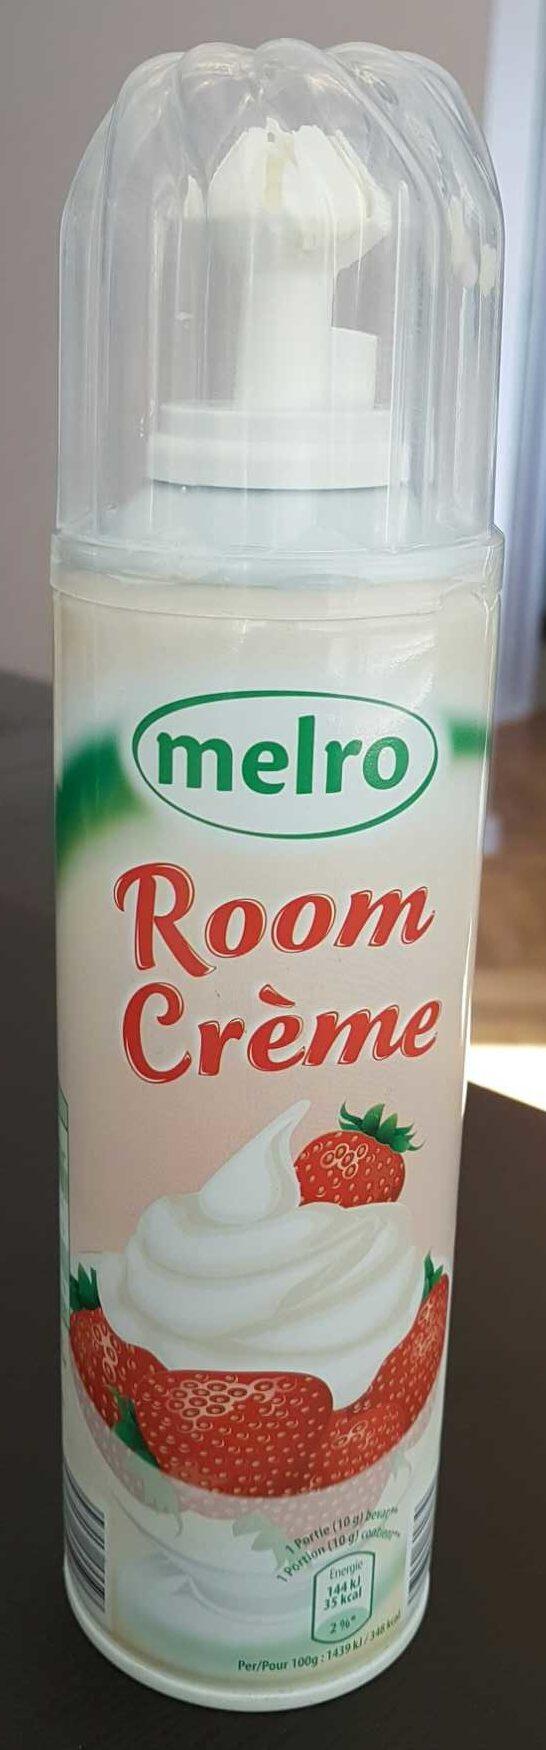 Room Crème - Product